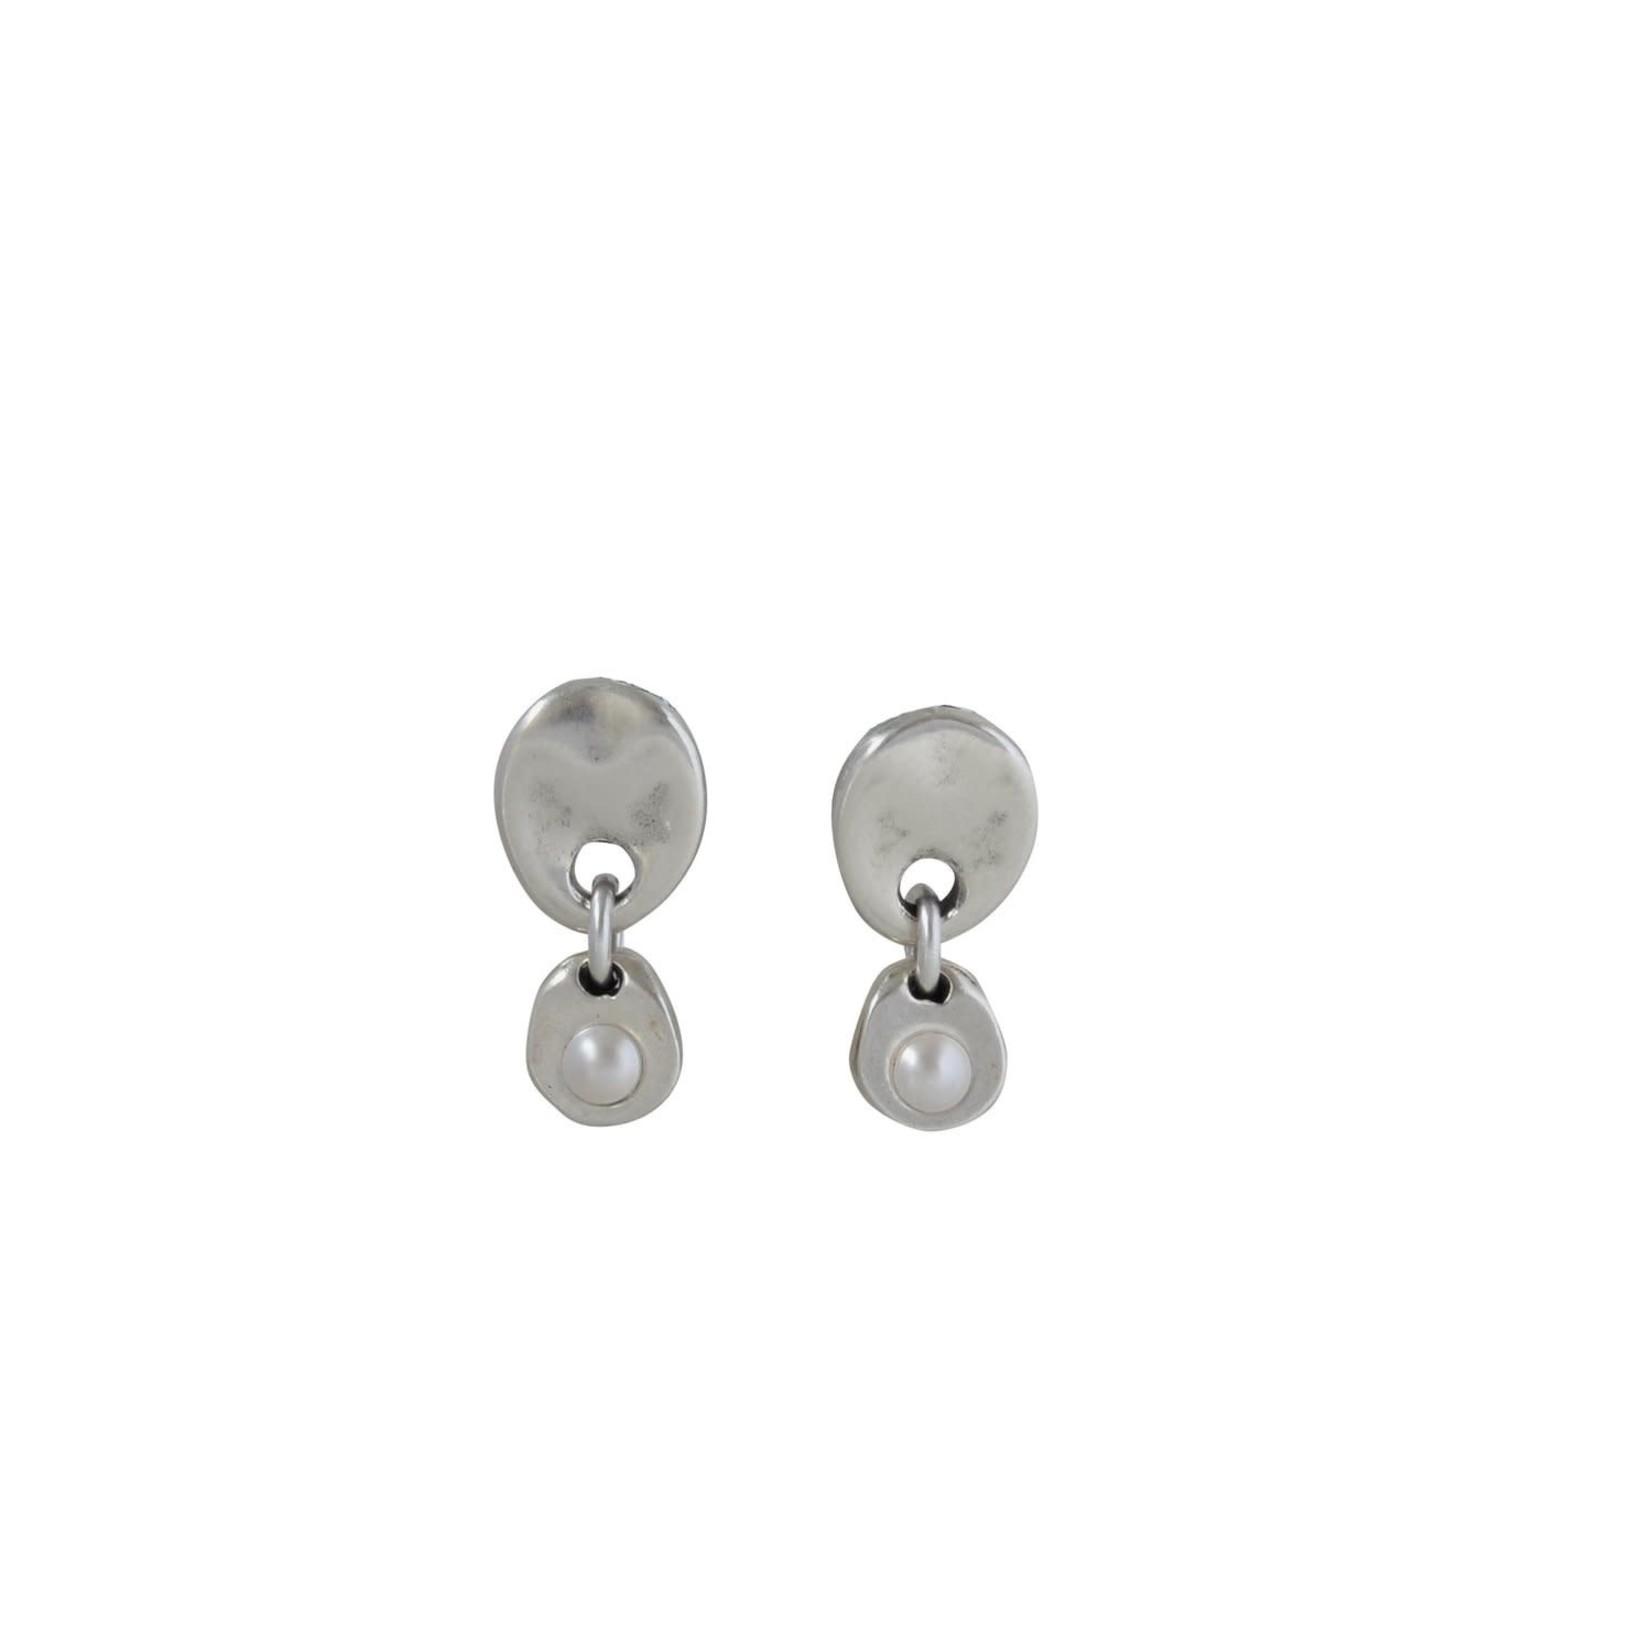 Earring/Amira/Pearl Post Drop